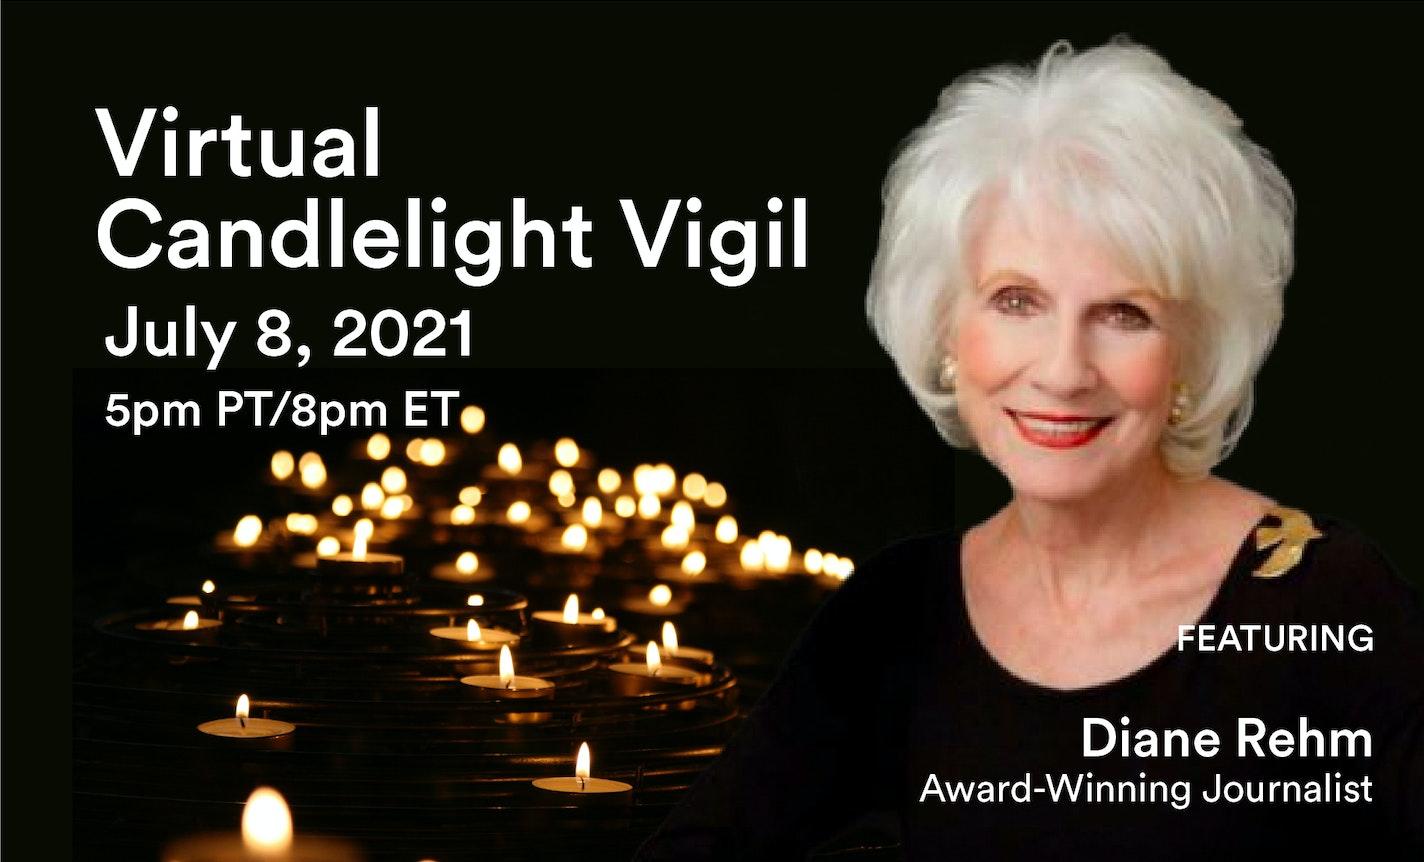 Reimagine Candlelight Vigil with Radio Host Diane Rehm